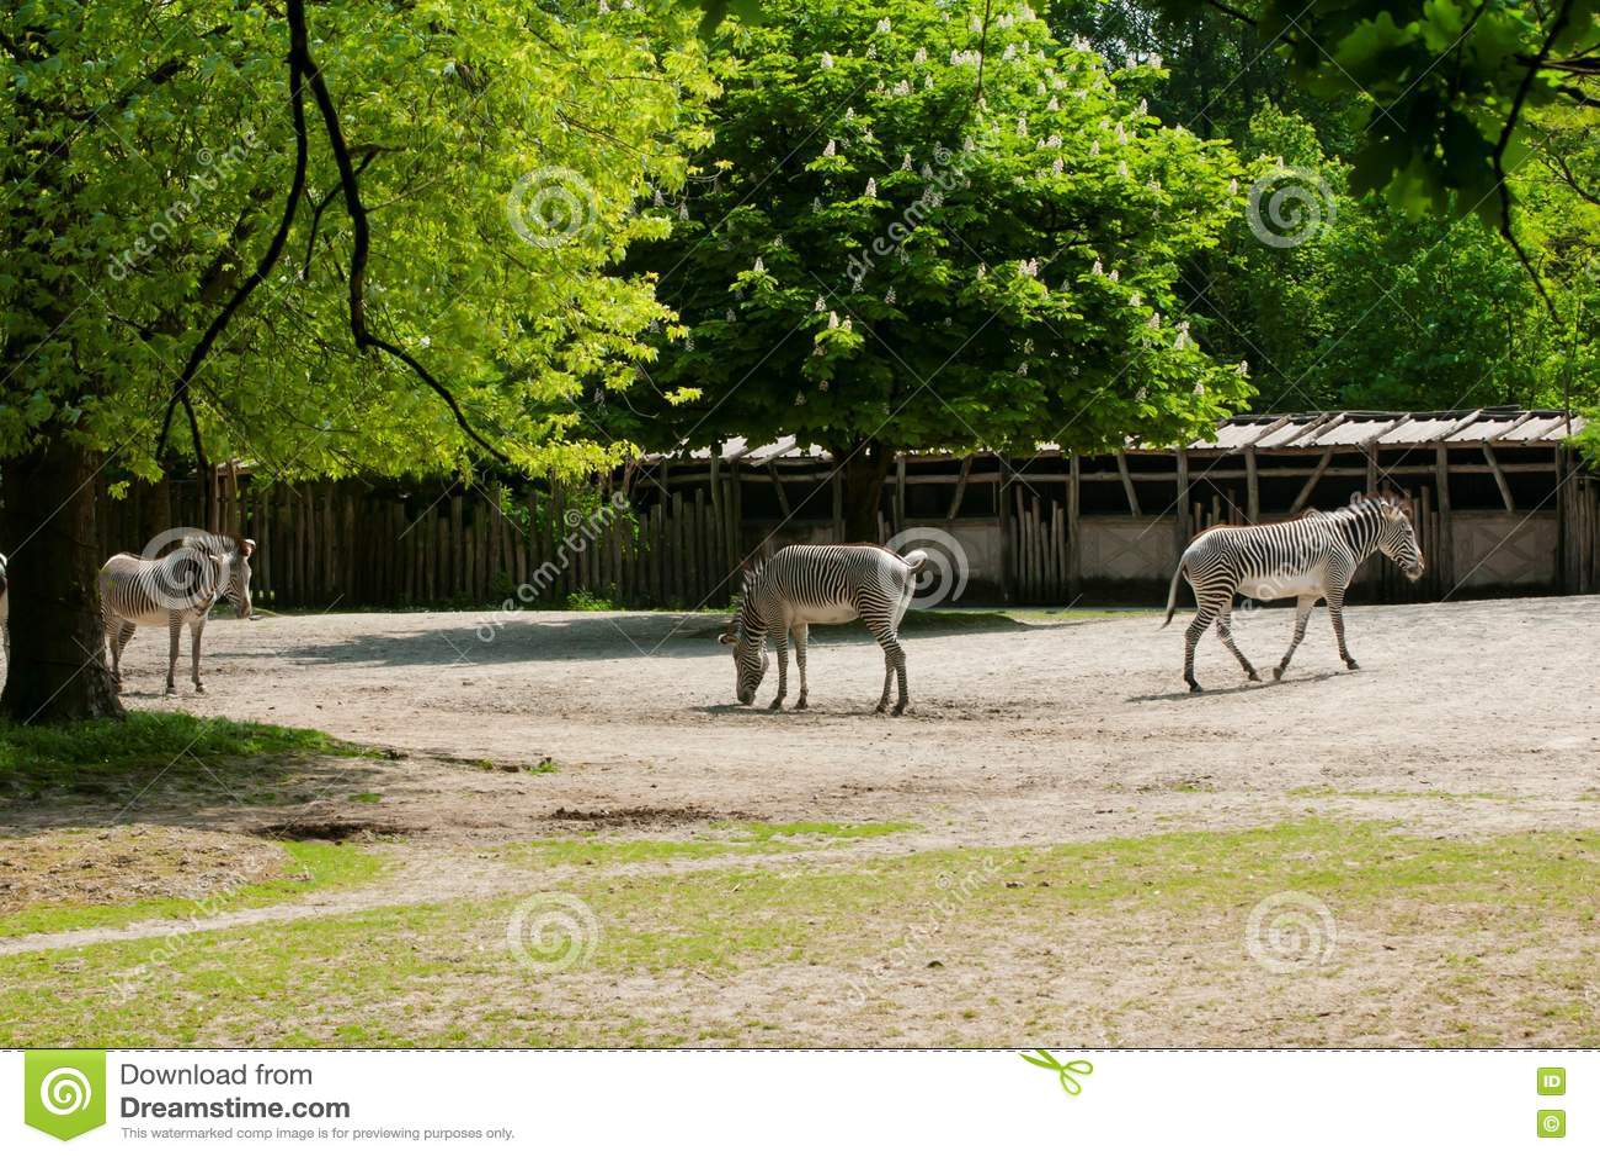 Mechelen, België - 17 Mei 2016: Zebras in Planckendael-dierentuin